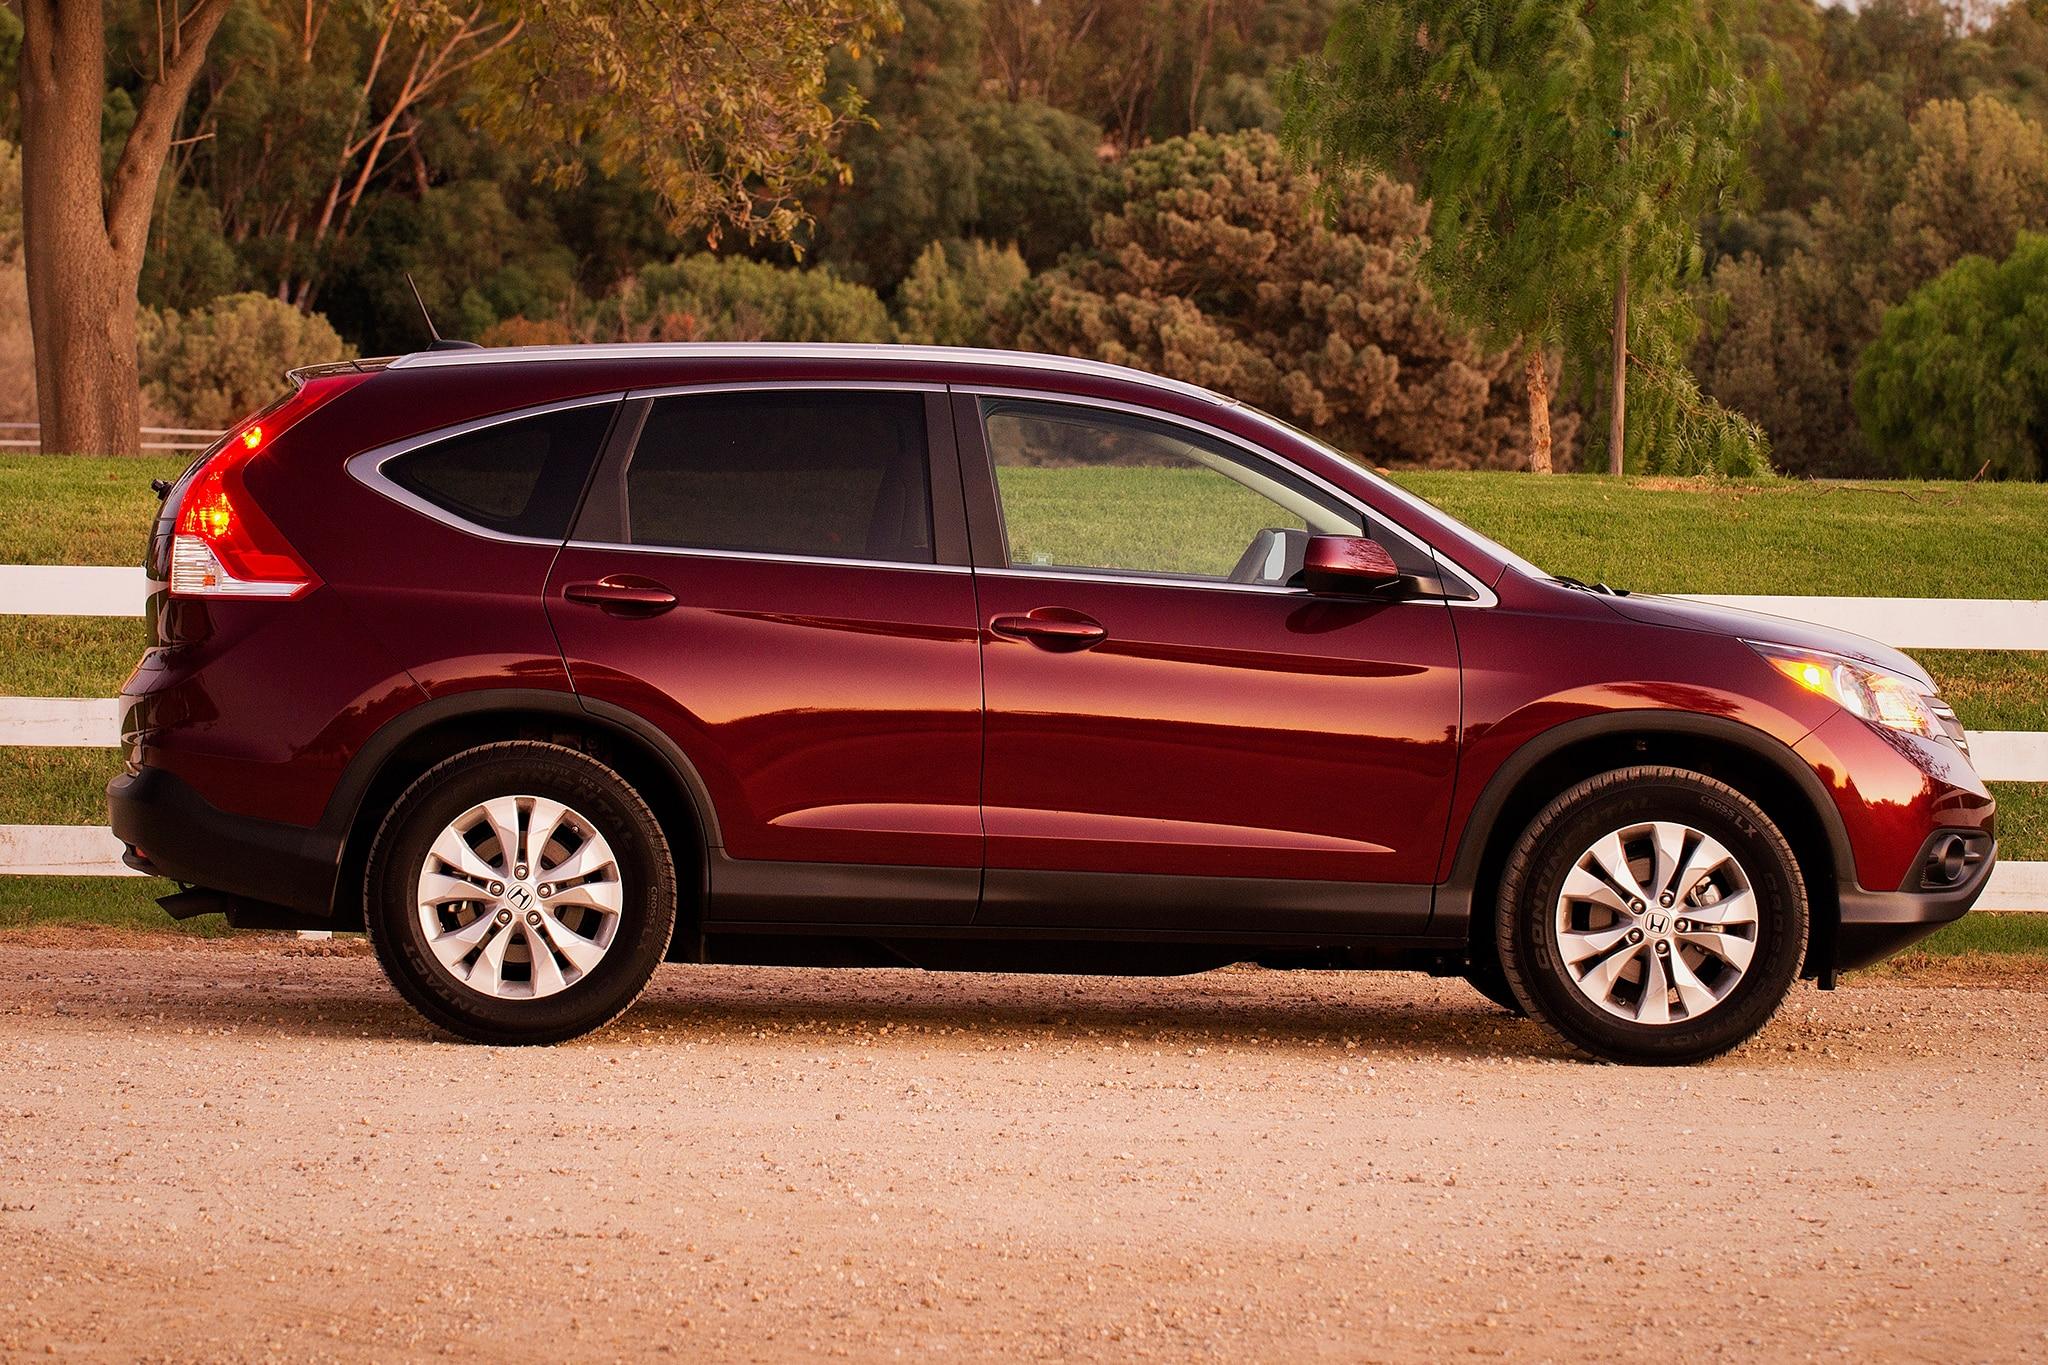 Honda CR-V Is Best-Selling CUV In April 2013